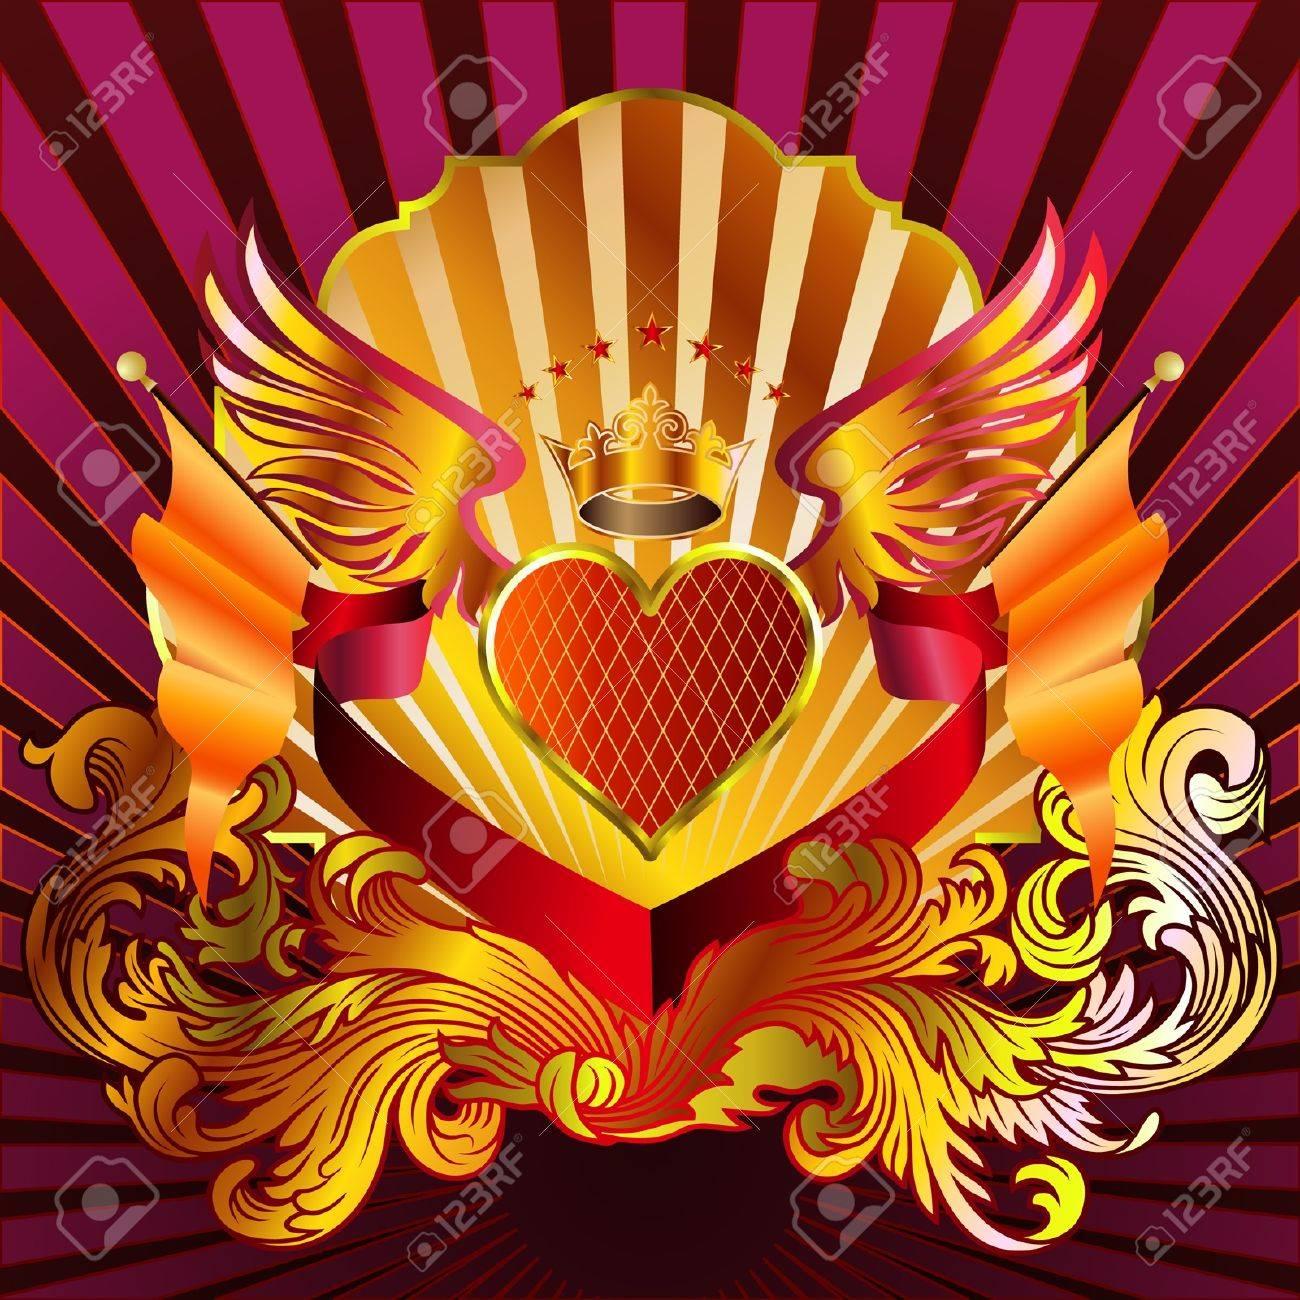 Heart Emblem 02 Stock Vector - 21648706